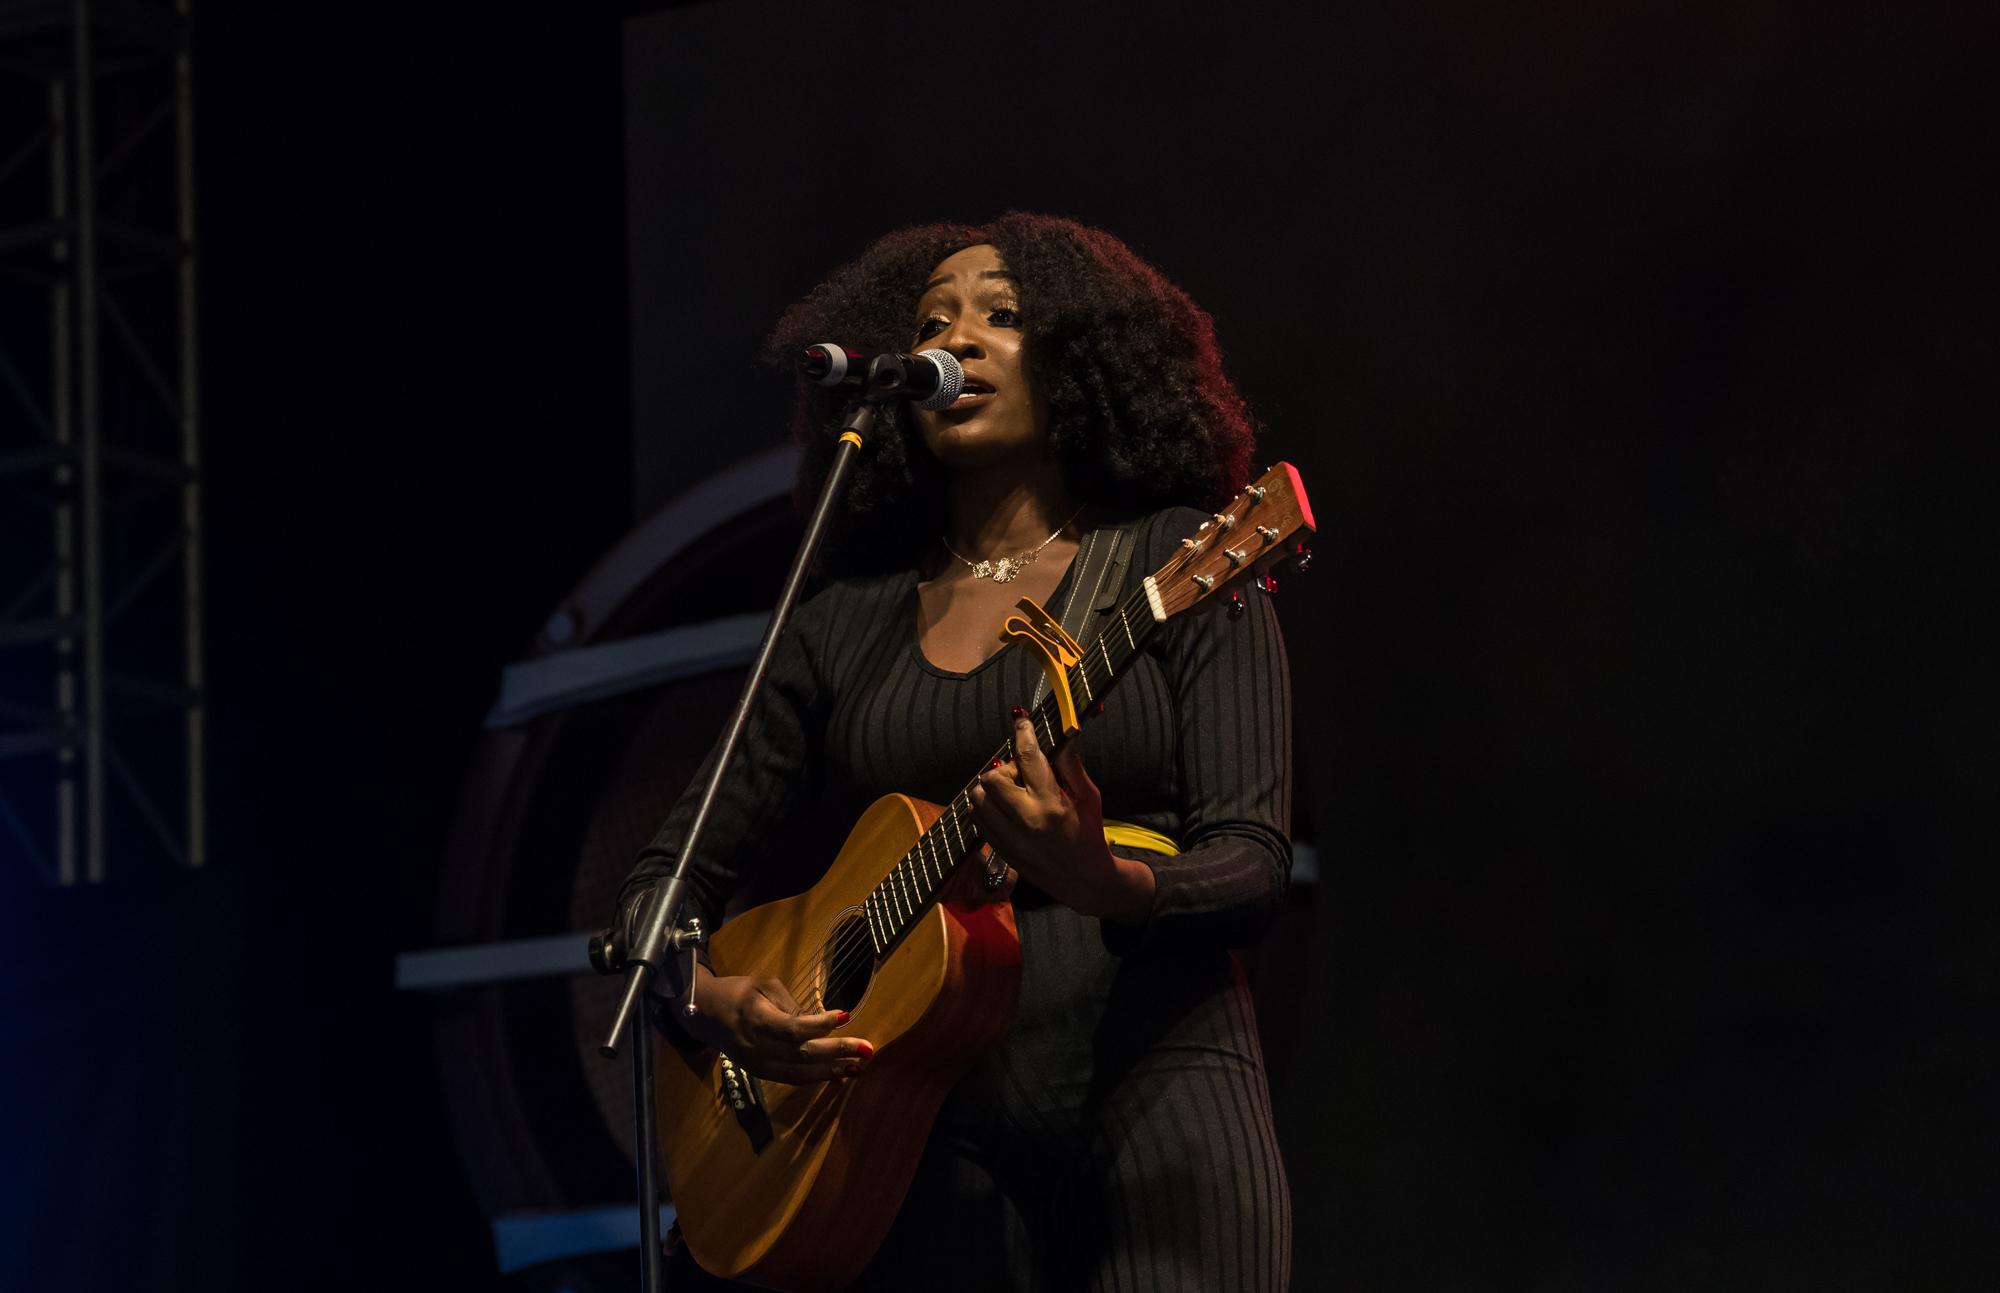 Lagos, Nigeria. 9th November 2018.  Aramide performing at Human Radio Concert. Photographed by Michael Tubes